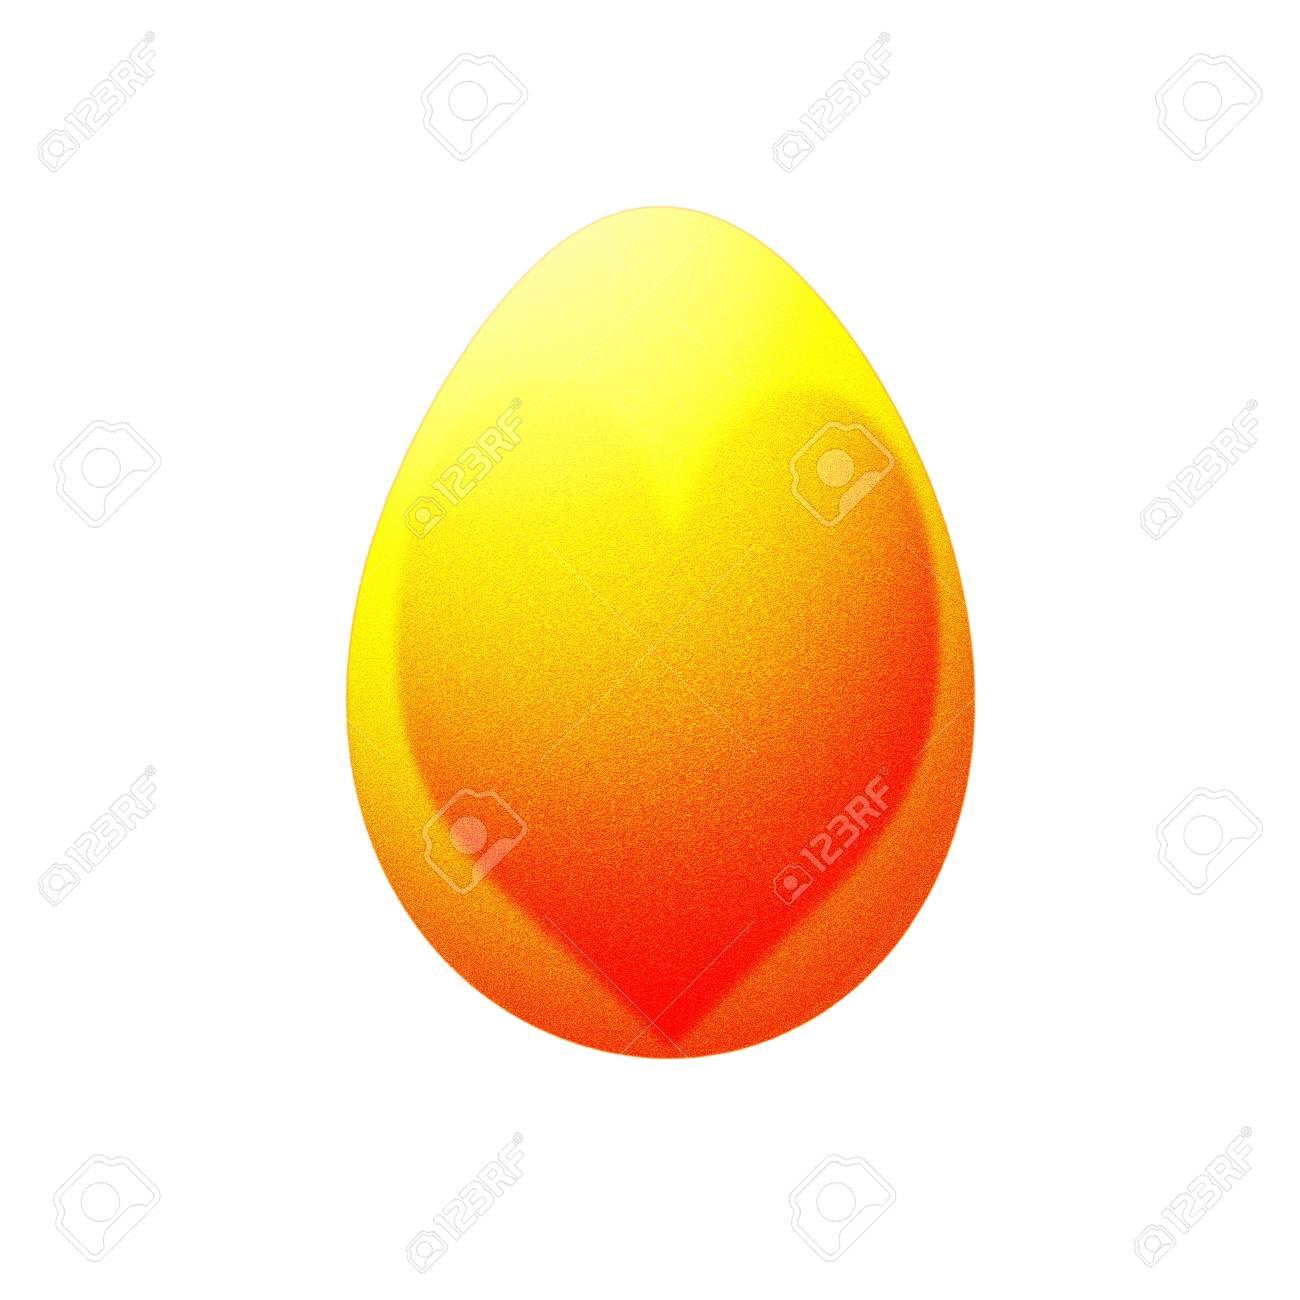 heart on easter egg isolated on white Stock Photo - 12937888